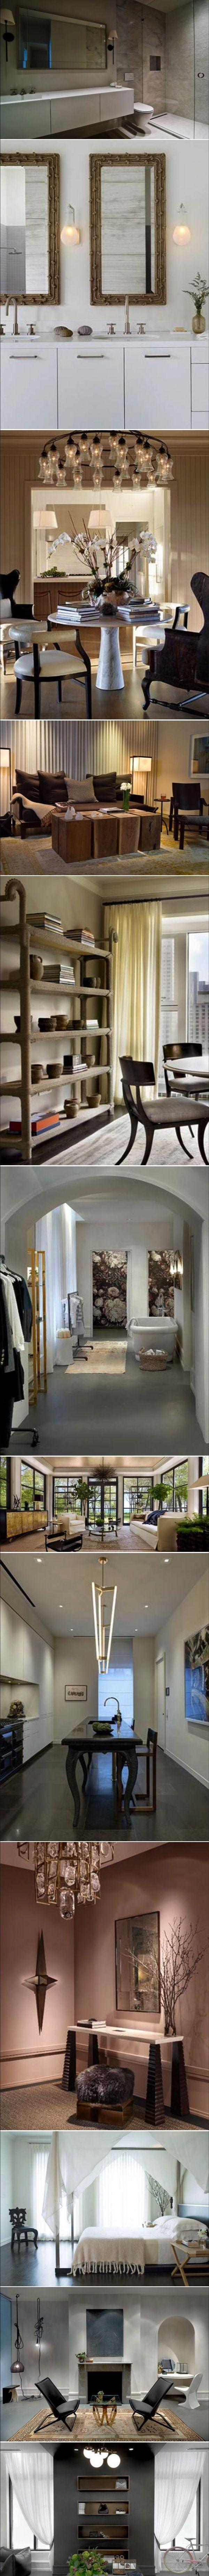 interior design tips from kara mann that make  big impact goop also   house rh nz pinterest